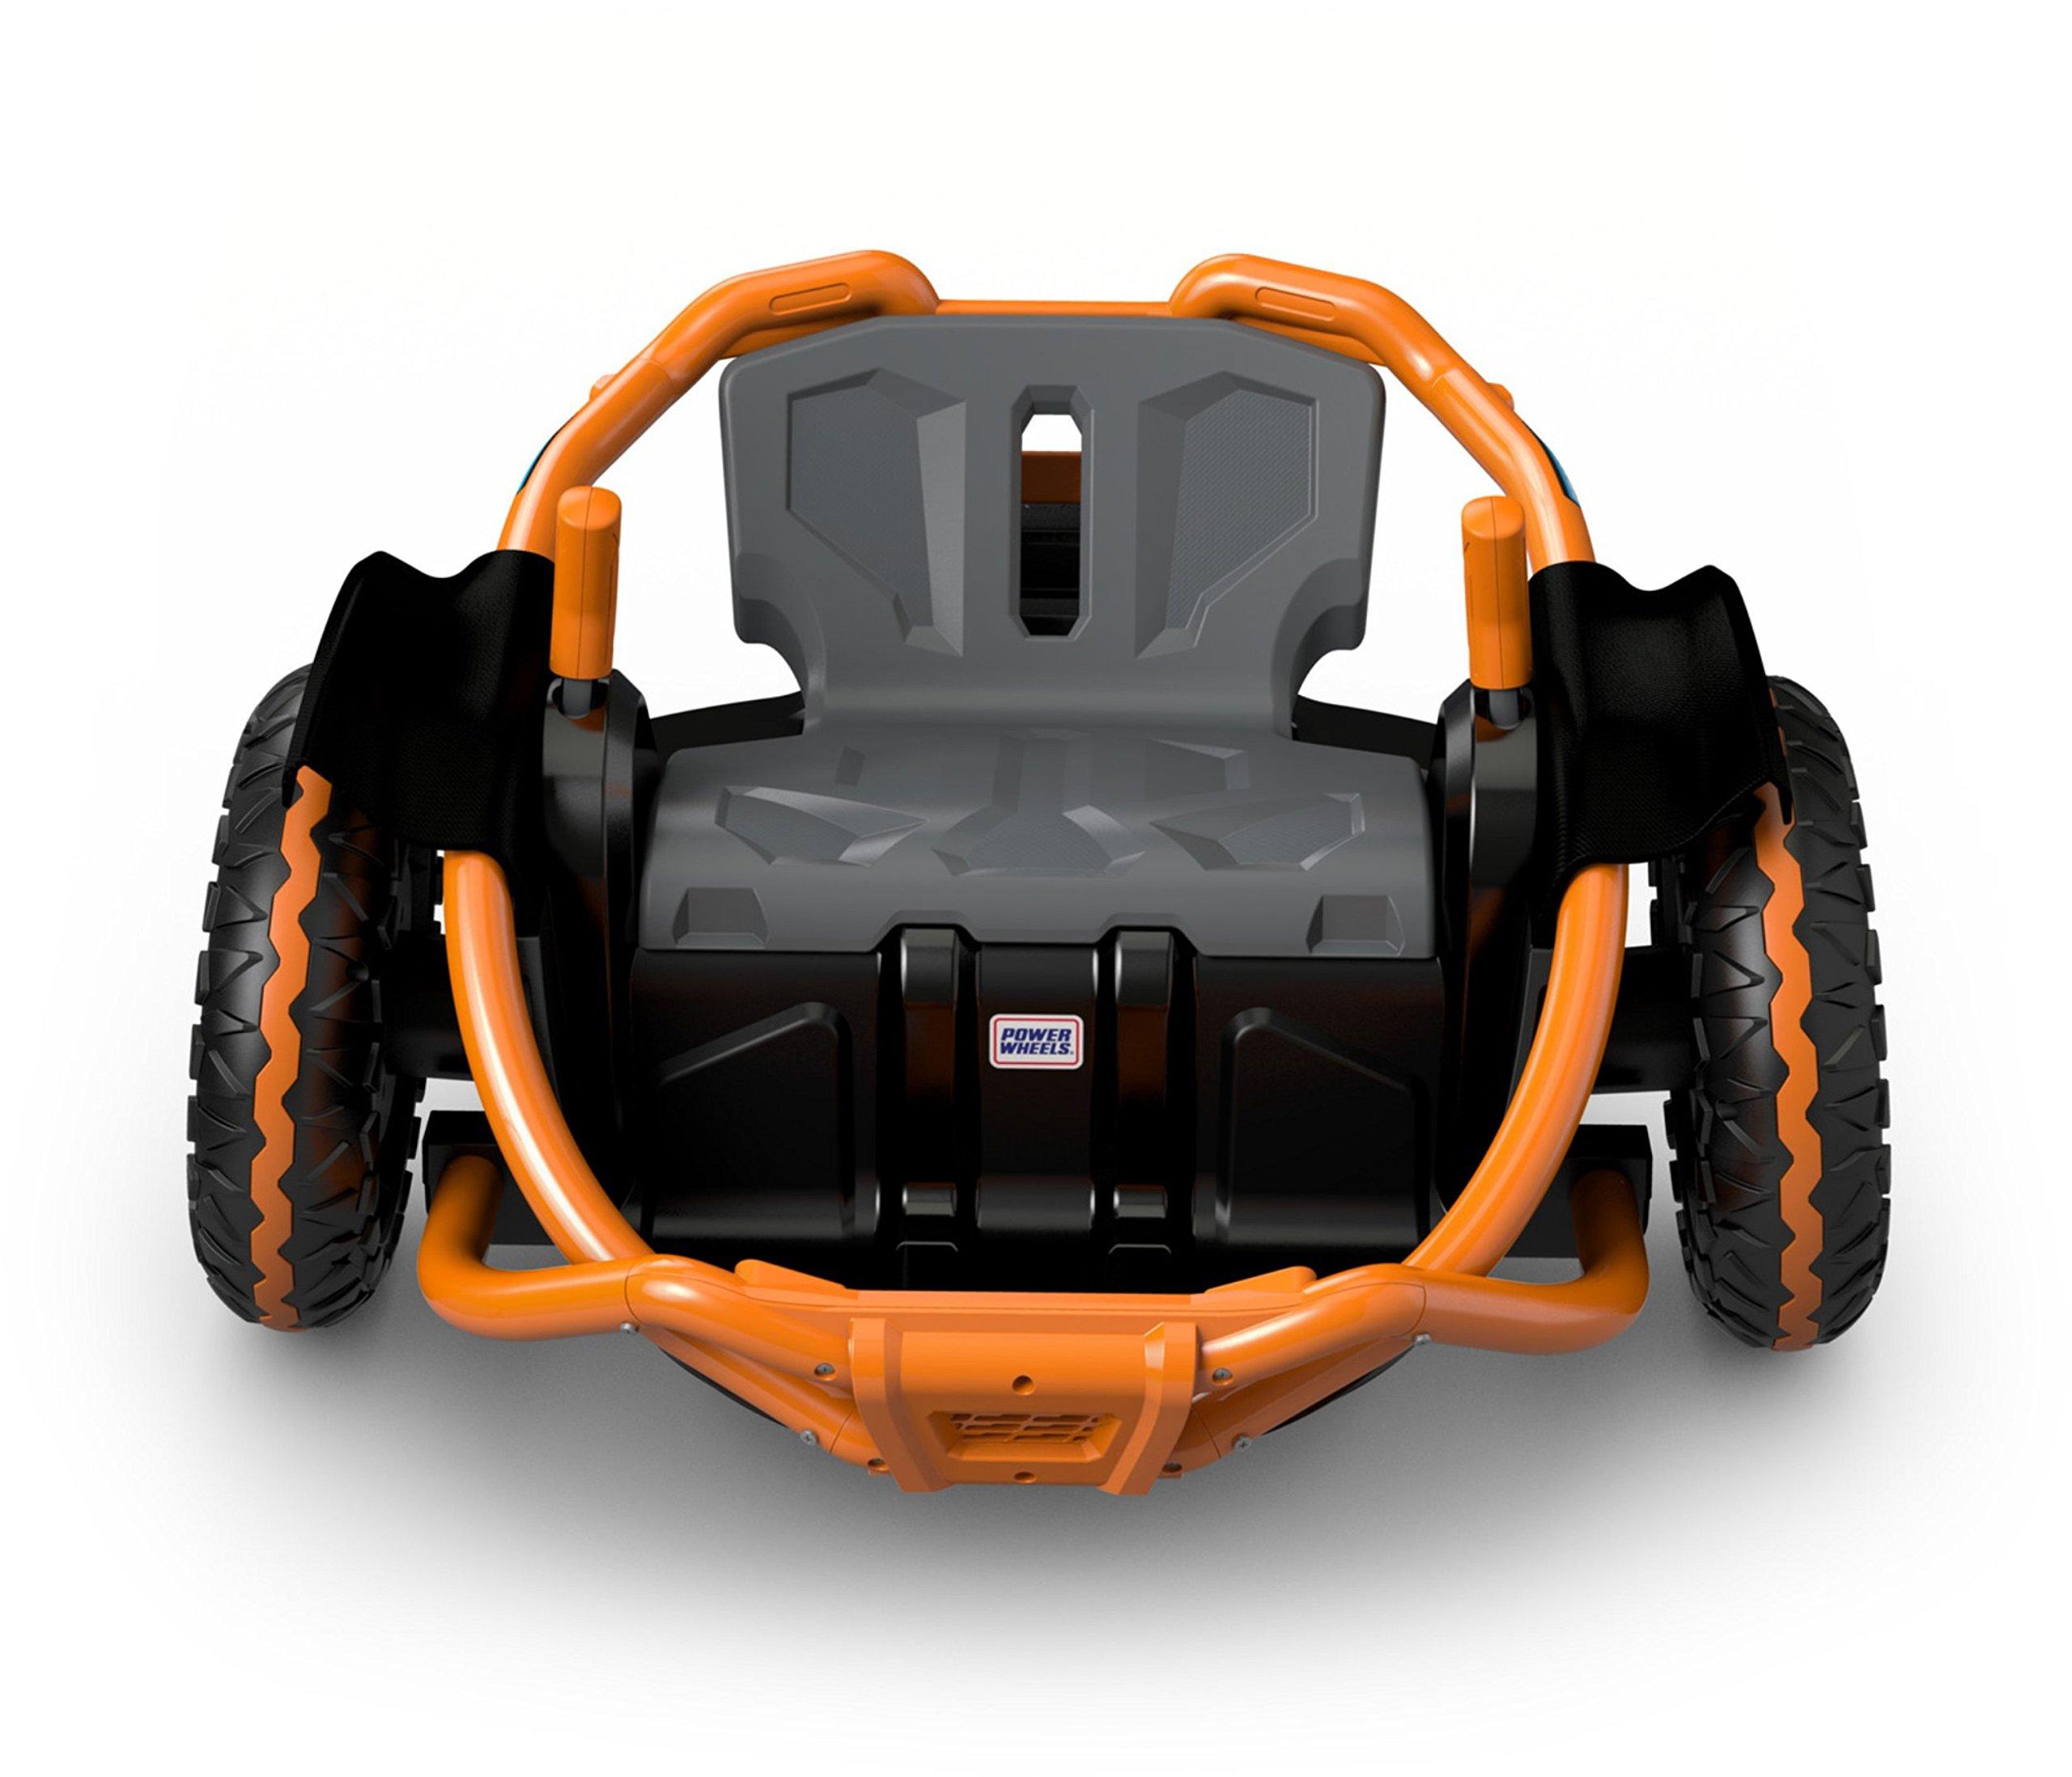 Power Wheels Wild Thing, Orange by Power Wheels (Image #7)